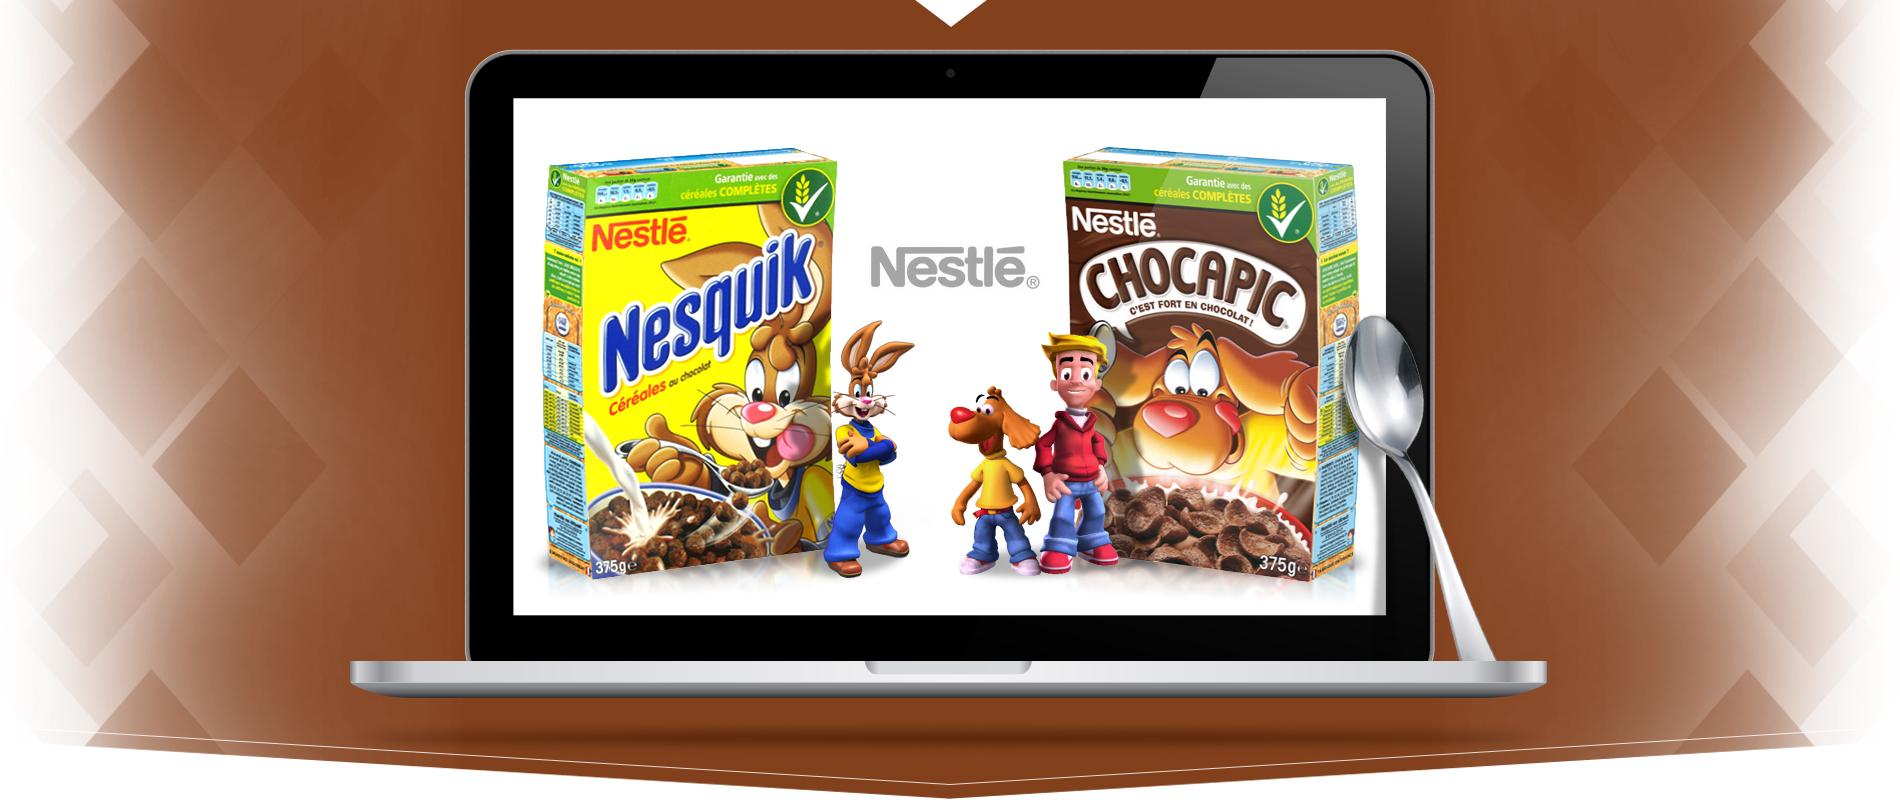 Push-Nestle